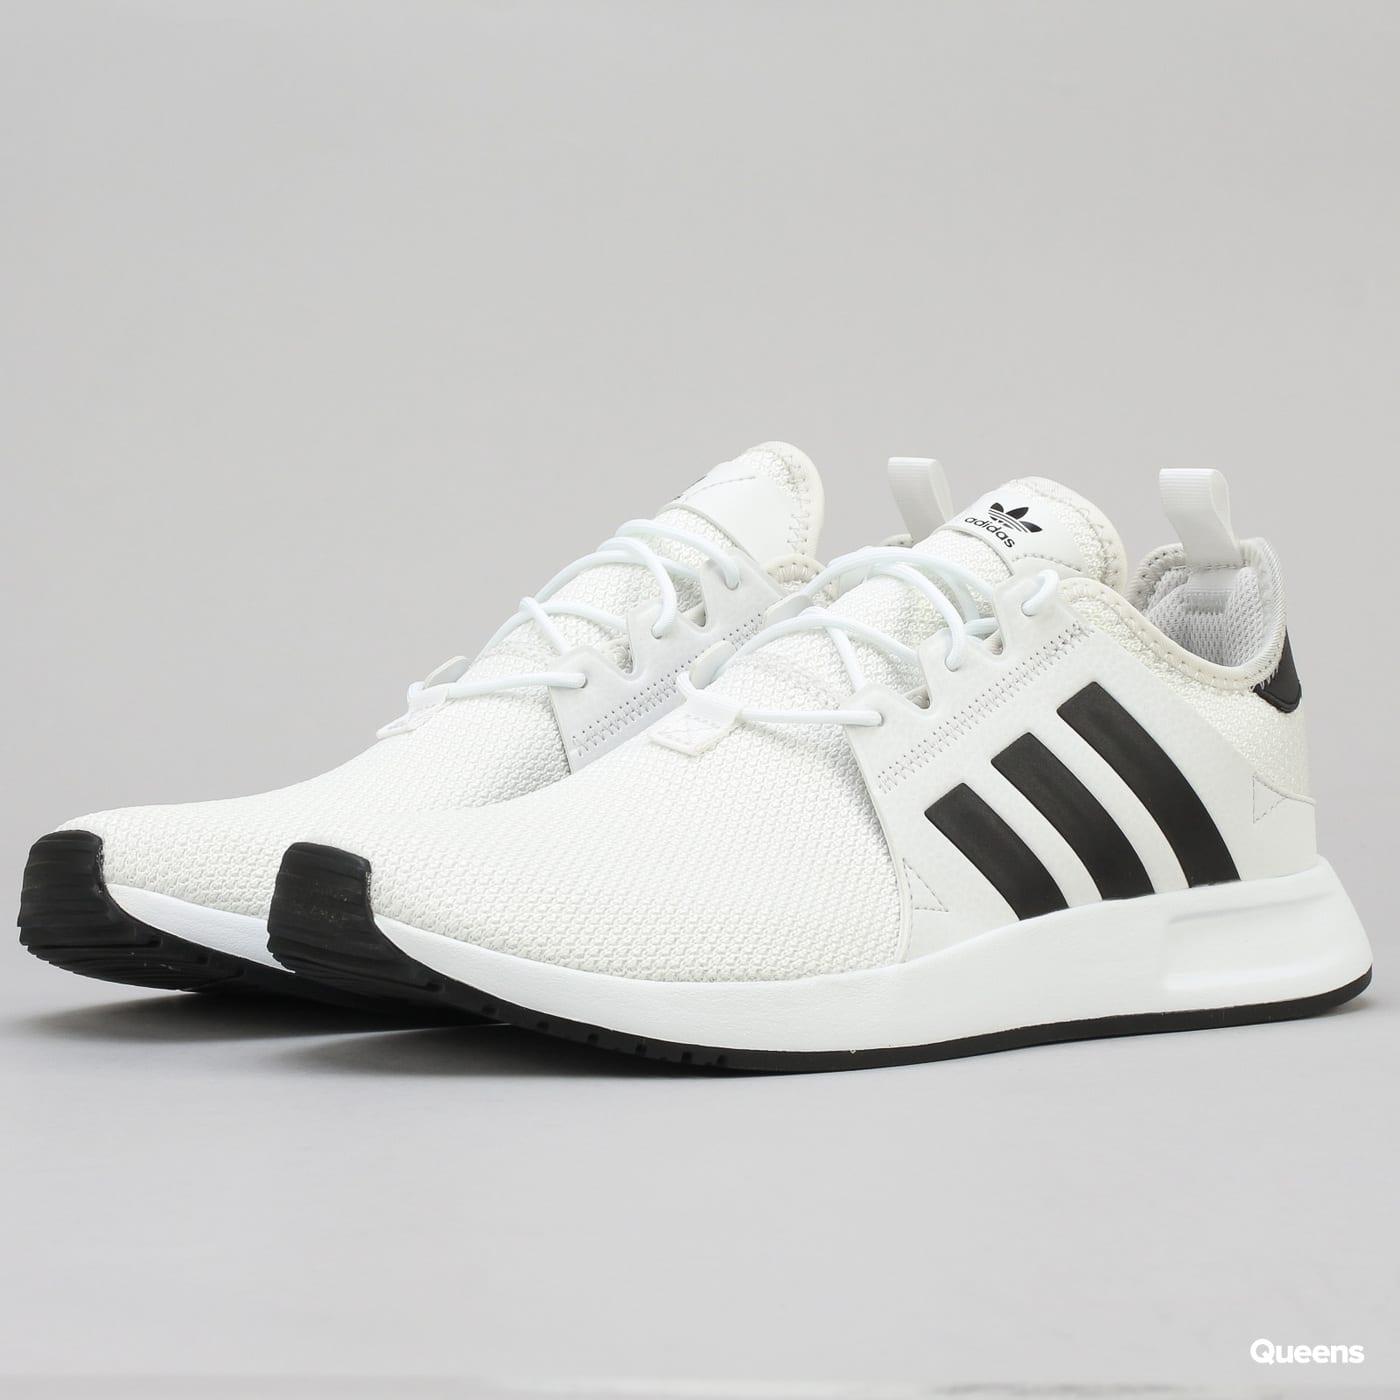 adidas Originals X_PLR whitin cblack ftwwht